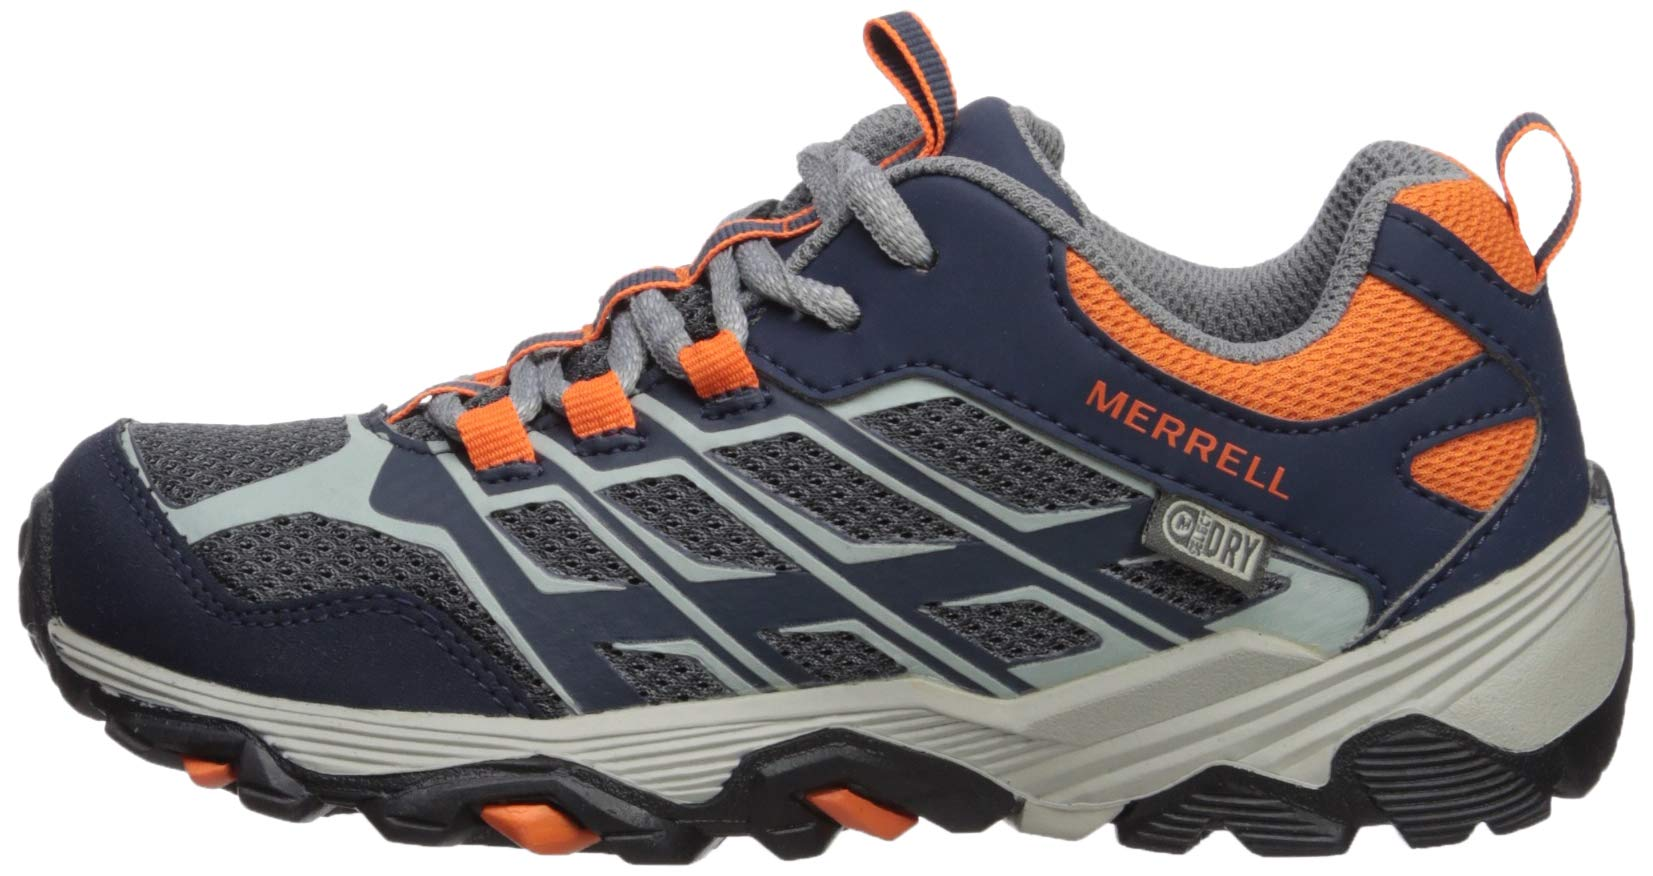 Merrell Unisex Kids' M-moab Fst Low Waterproof Rise Hiking Boots 5